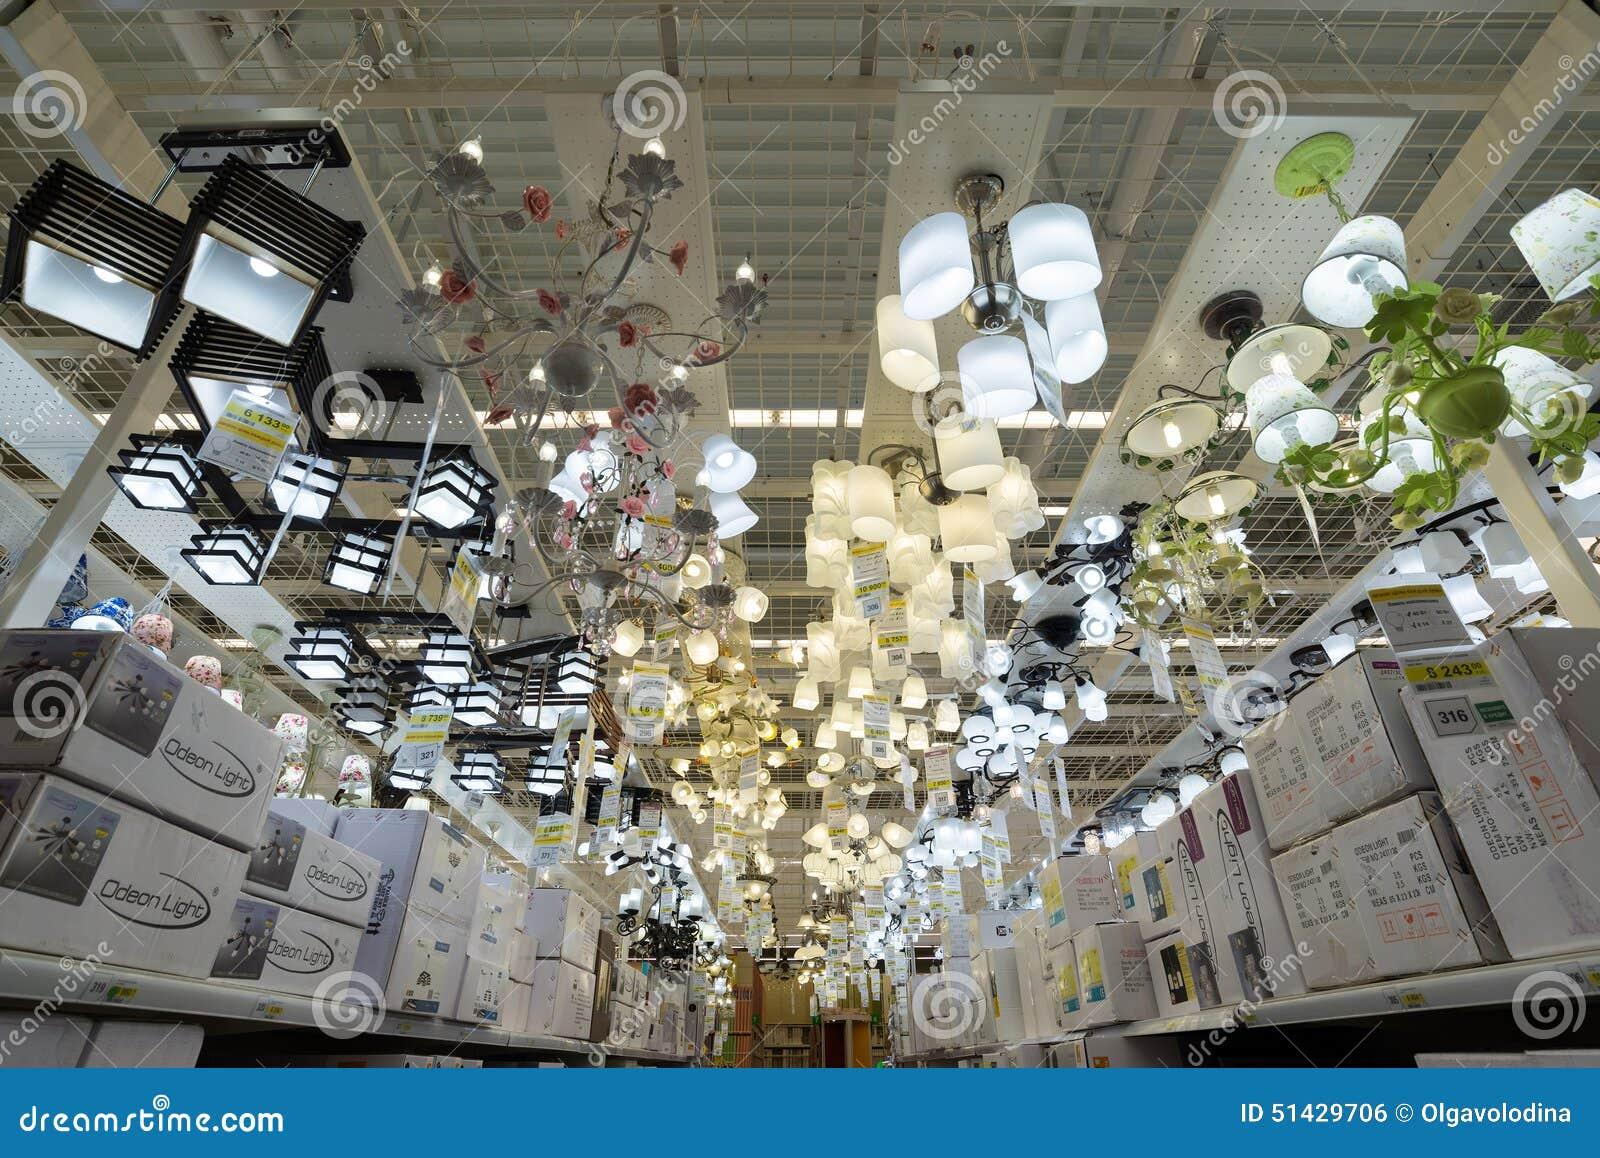 chandeliers of the leroy merlin store leroy merlin is a. Black Bedroom Furniture Sets. Home Design Ideas